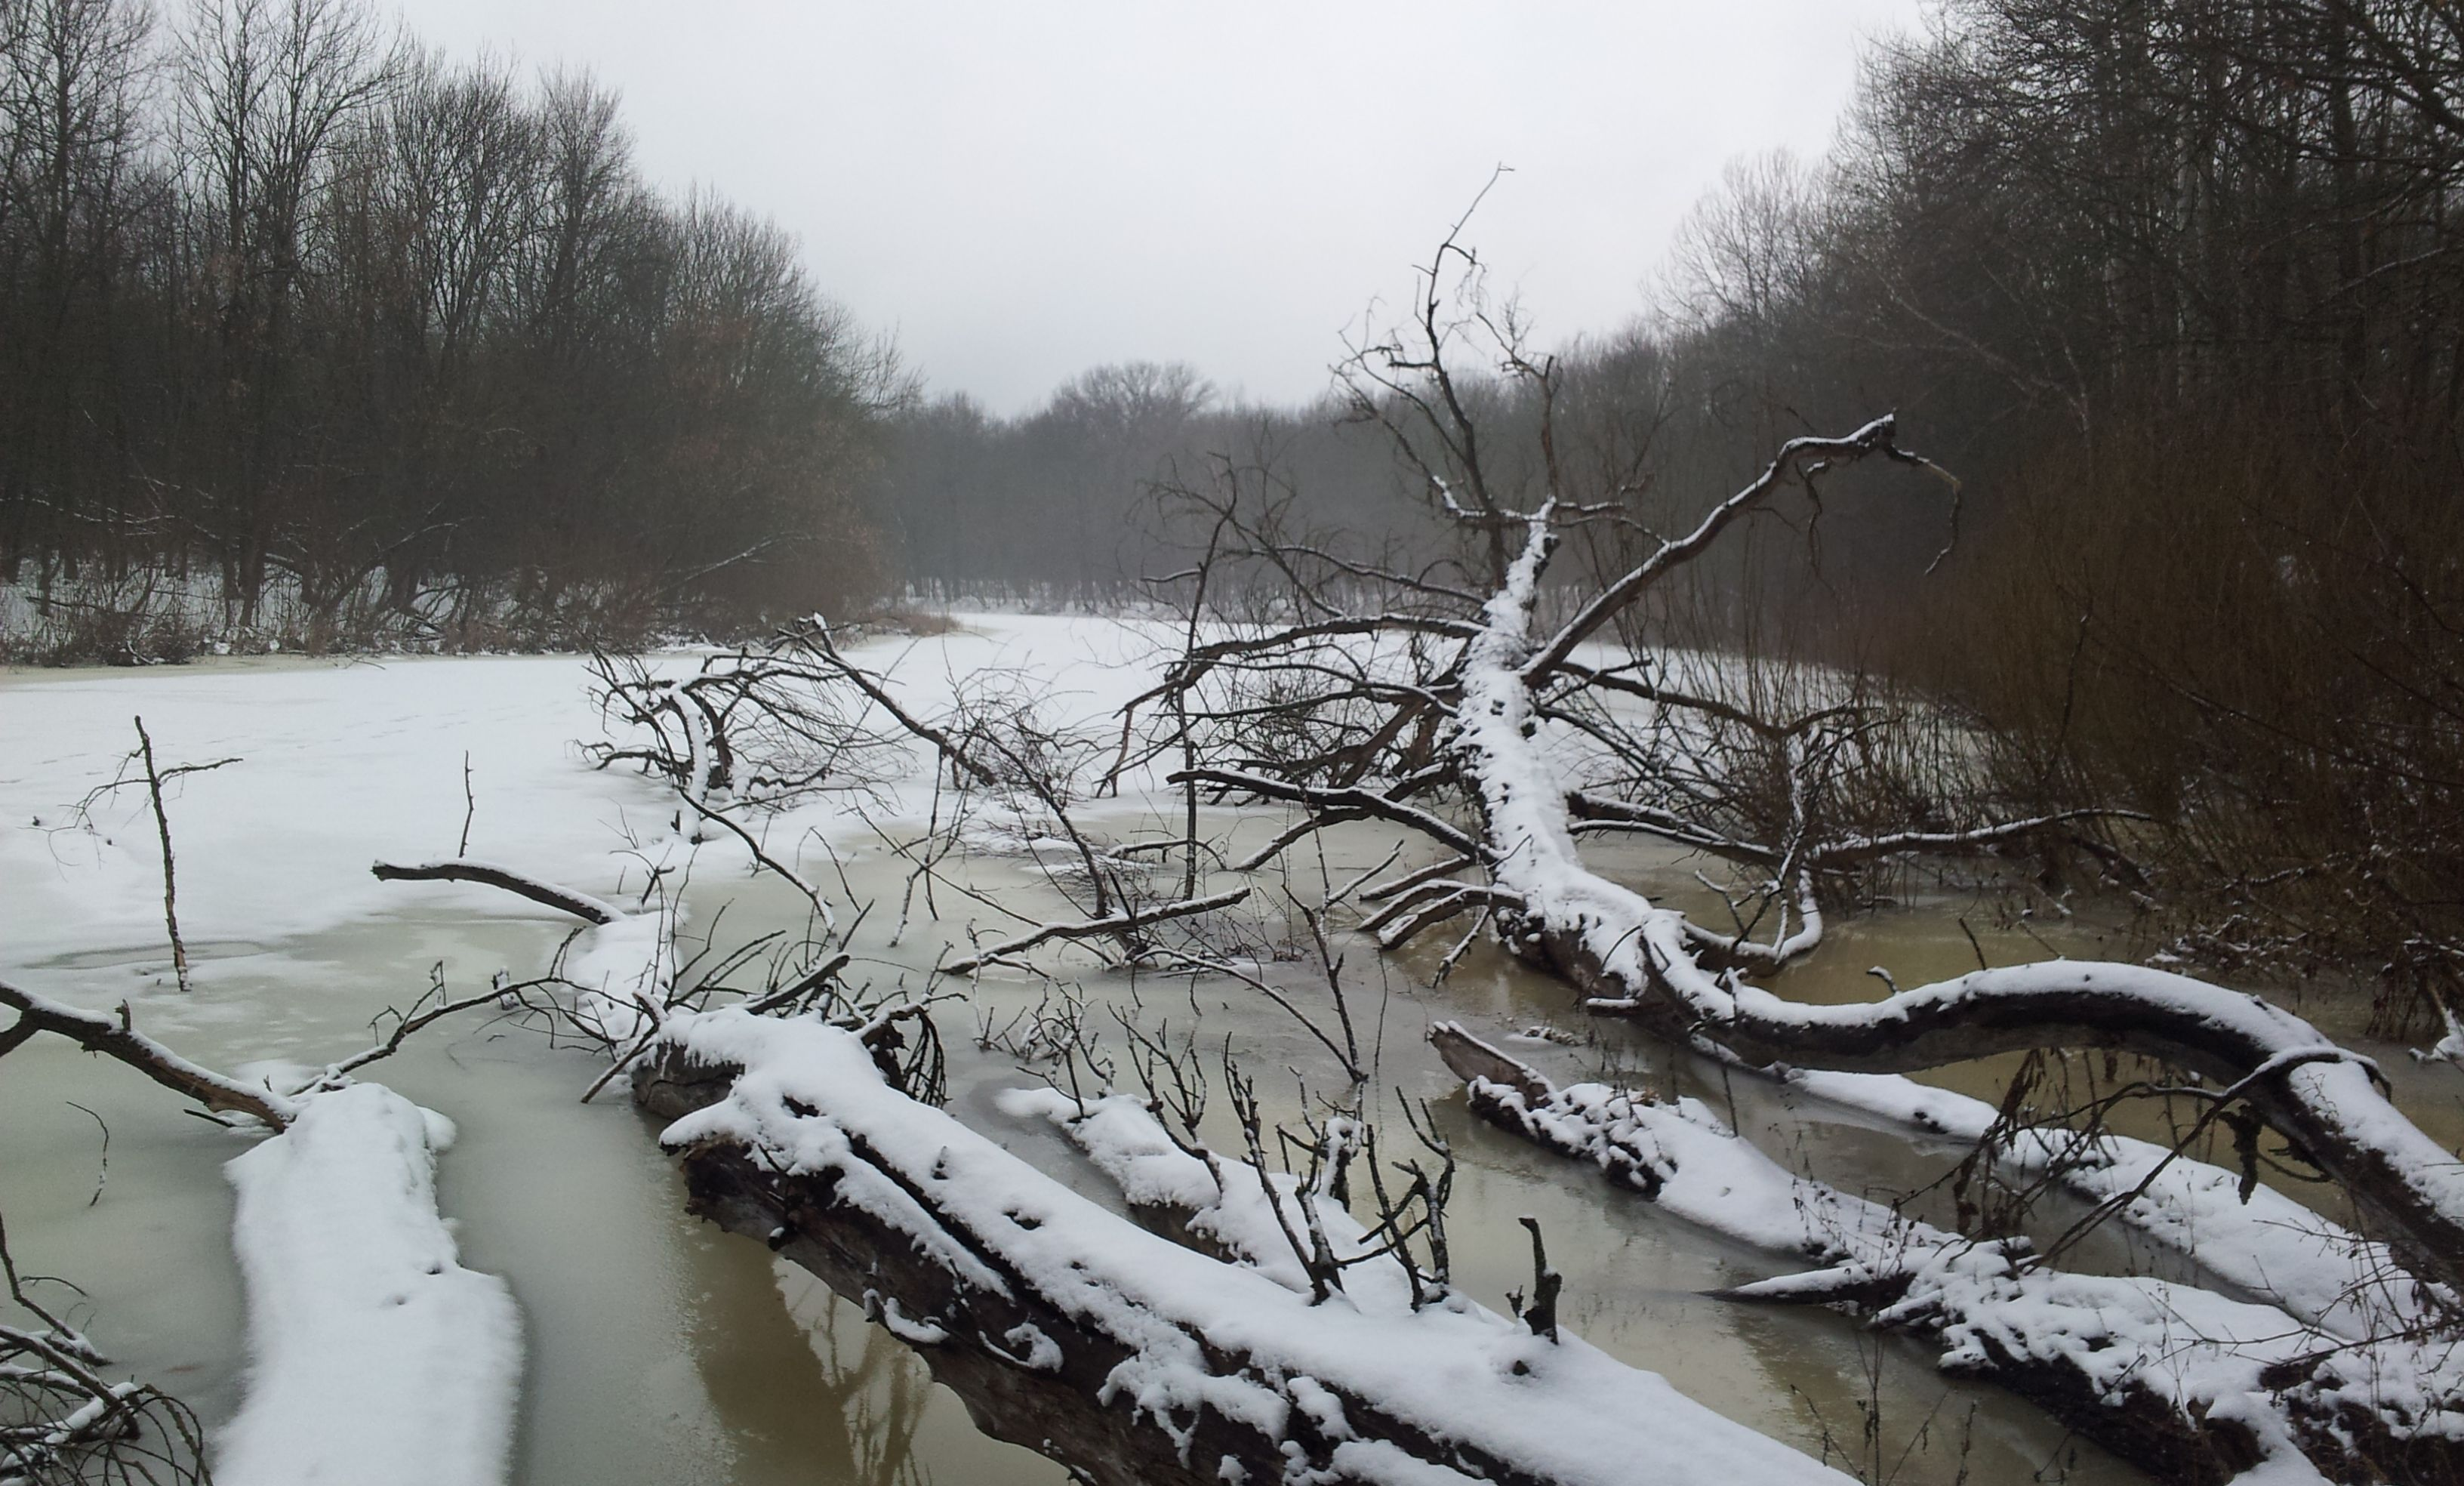 В Маловишерском районе Opel застрял в болоте. Пострадали двое